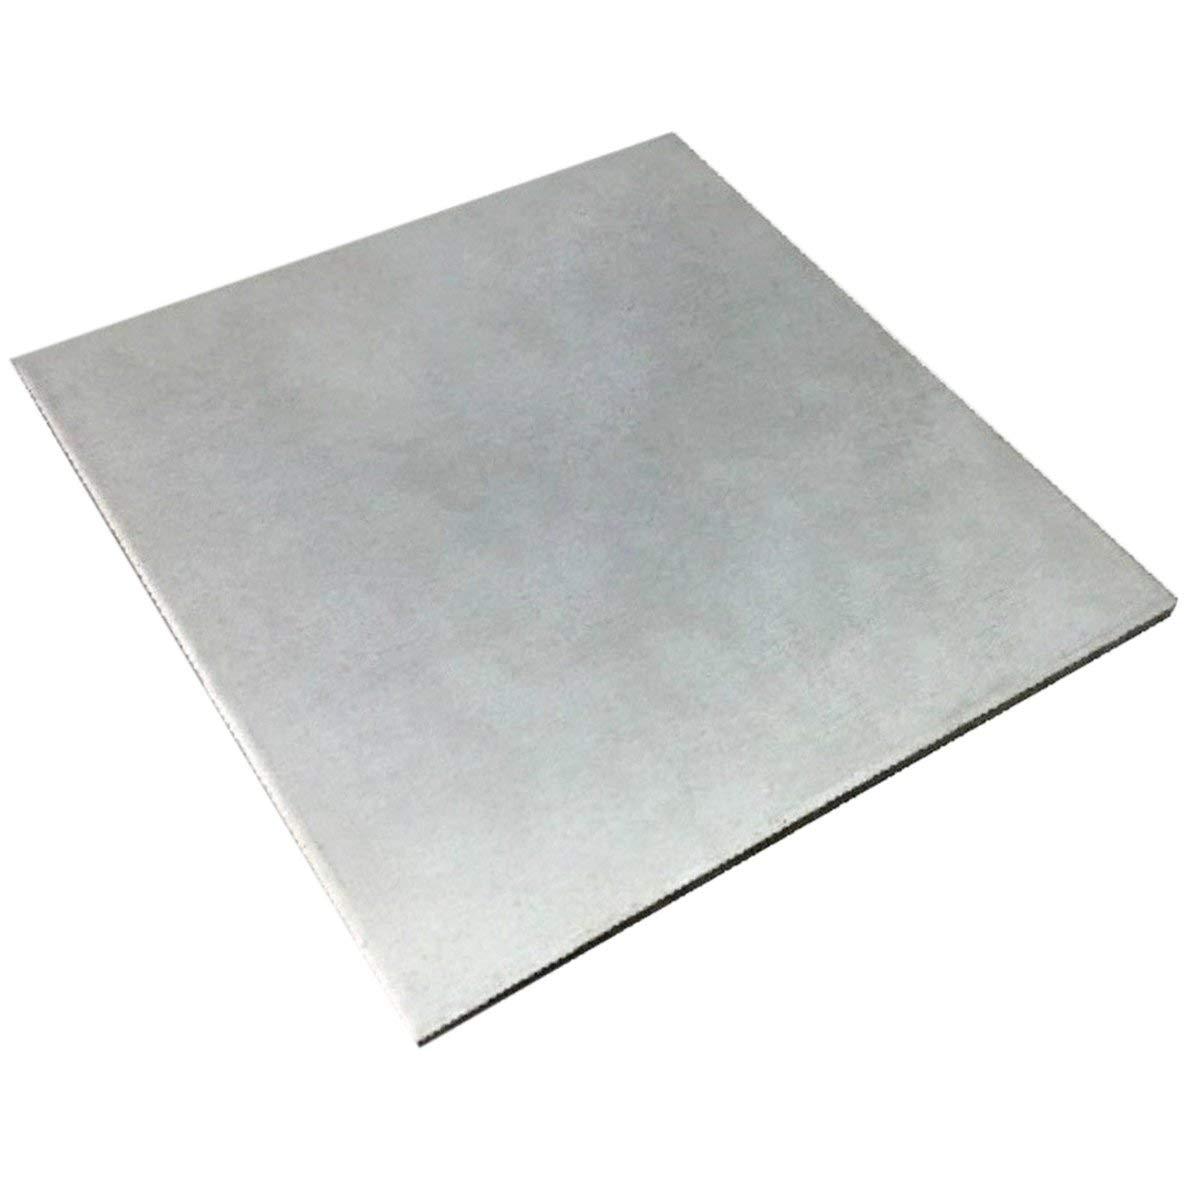 WILLAI 1pc Thin Titanium Metal Plate TC4/GR5 ASTM B54 Ti Sheet Foil with Corrosion Resistance 0.5mmx100mmx100mm